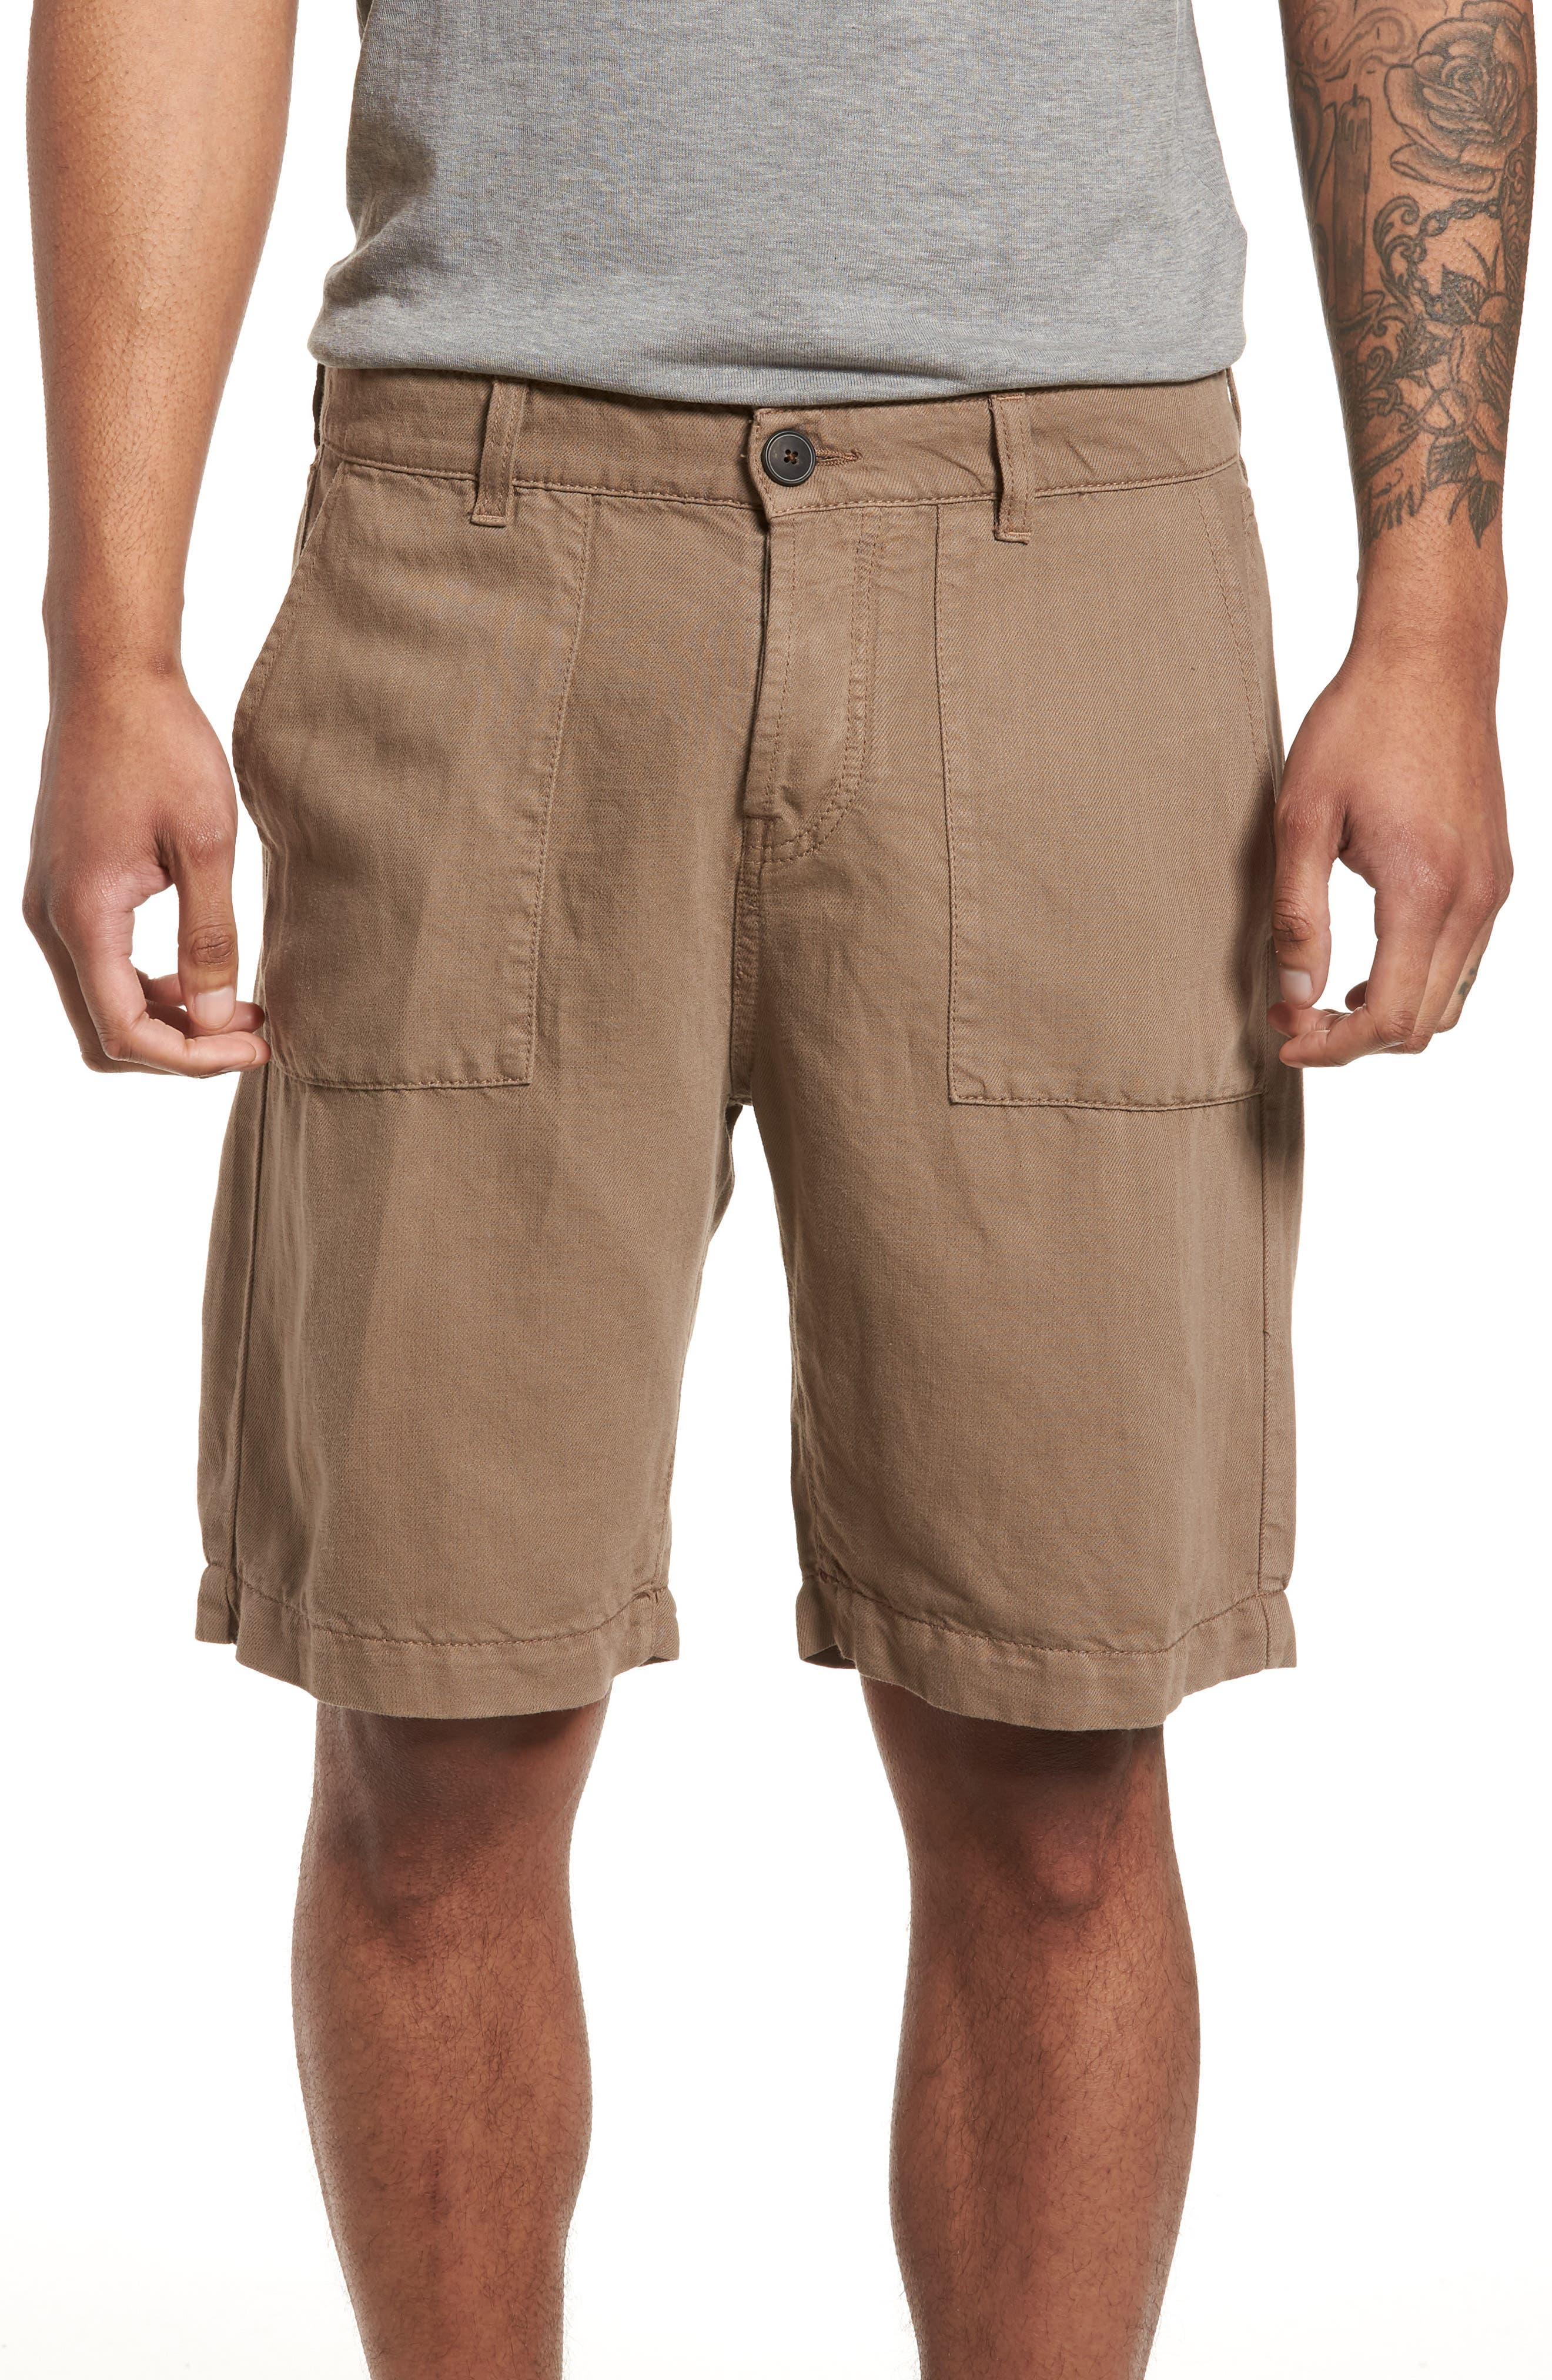 Fatique Bermuda Shorts,                             Main thumbnail 1, color,                             Taupe